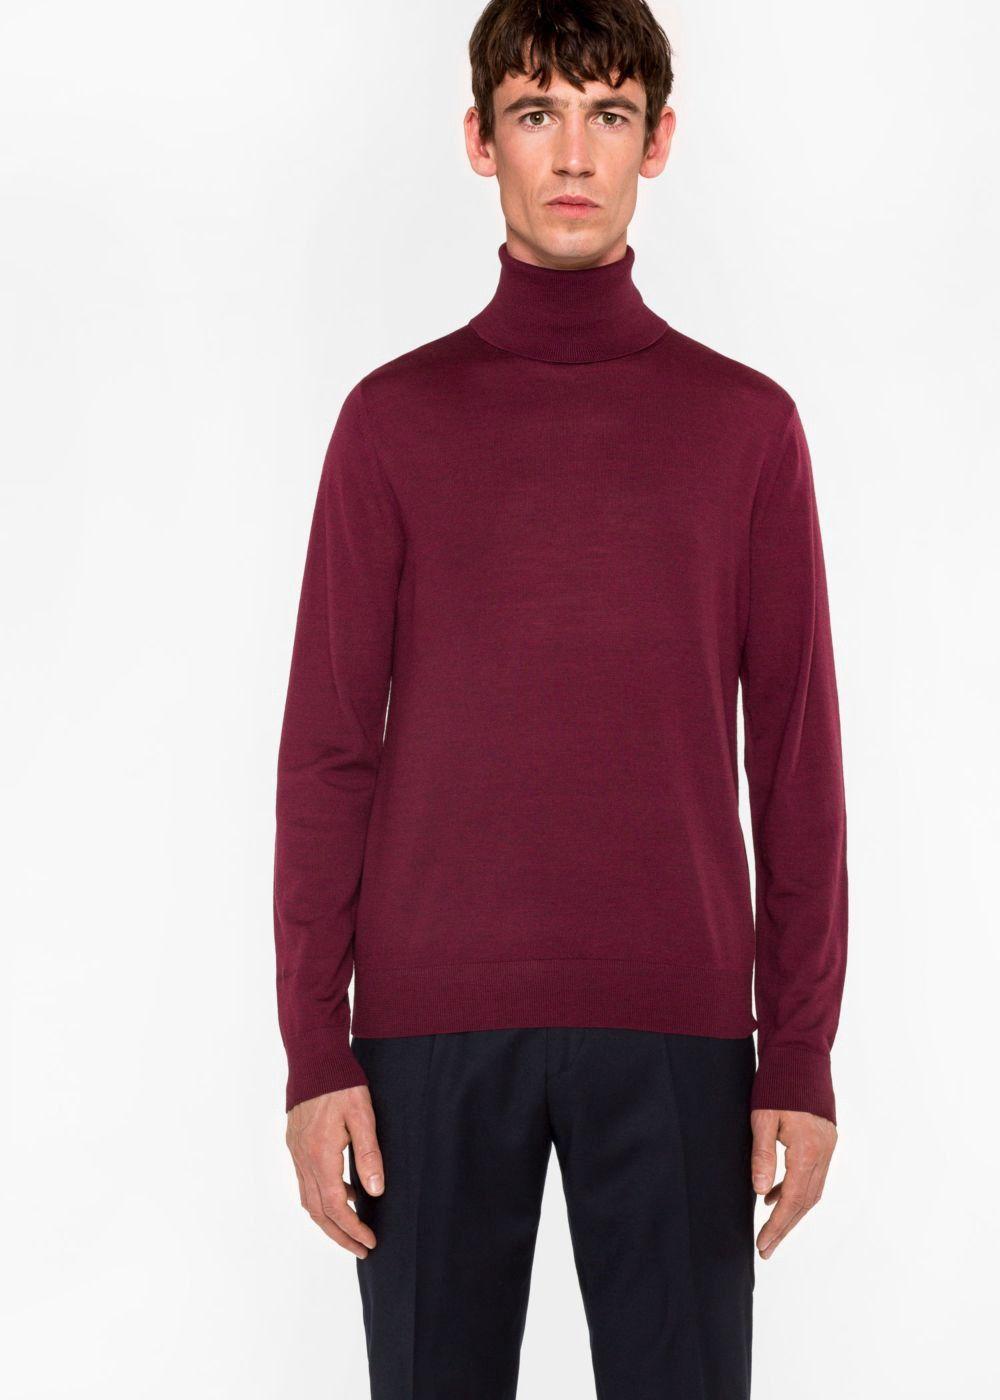 88f74ea066c903 PAUL SMITH Men's Burgundy Merino Wool Roll Neck Sweater. #paulsmith #cloth #